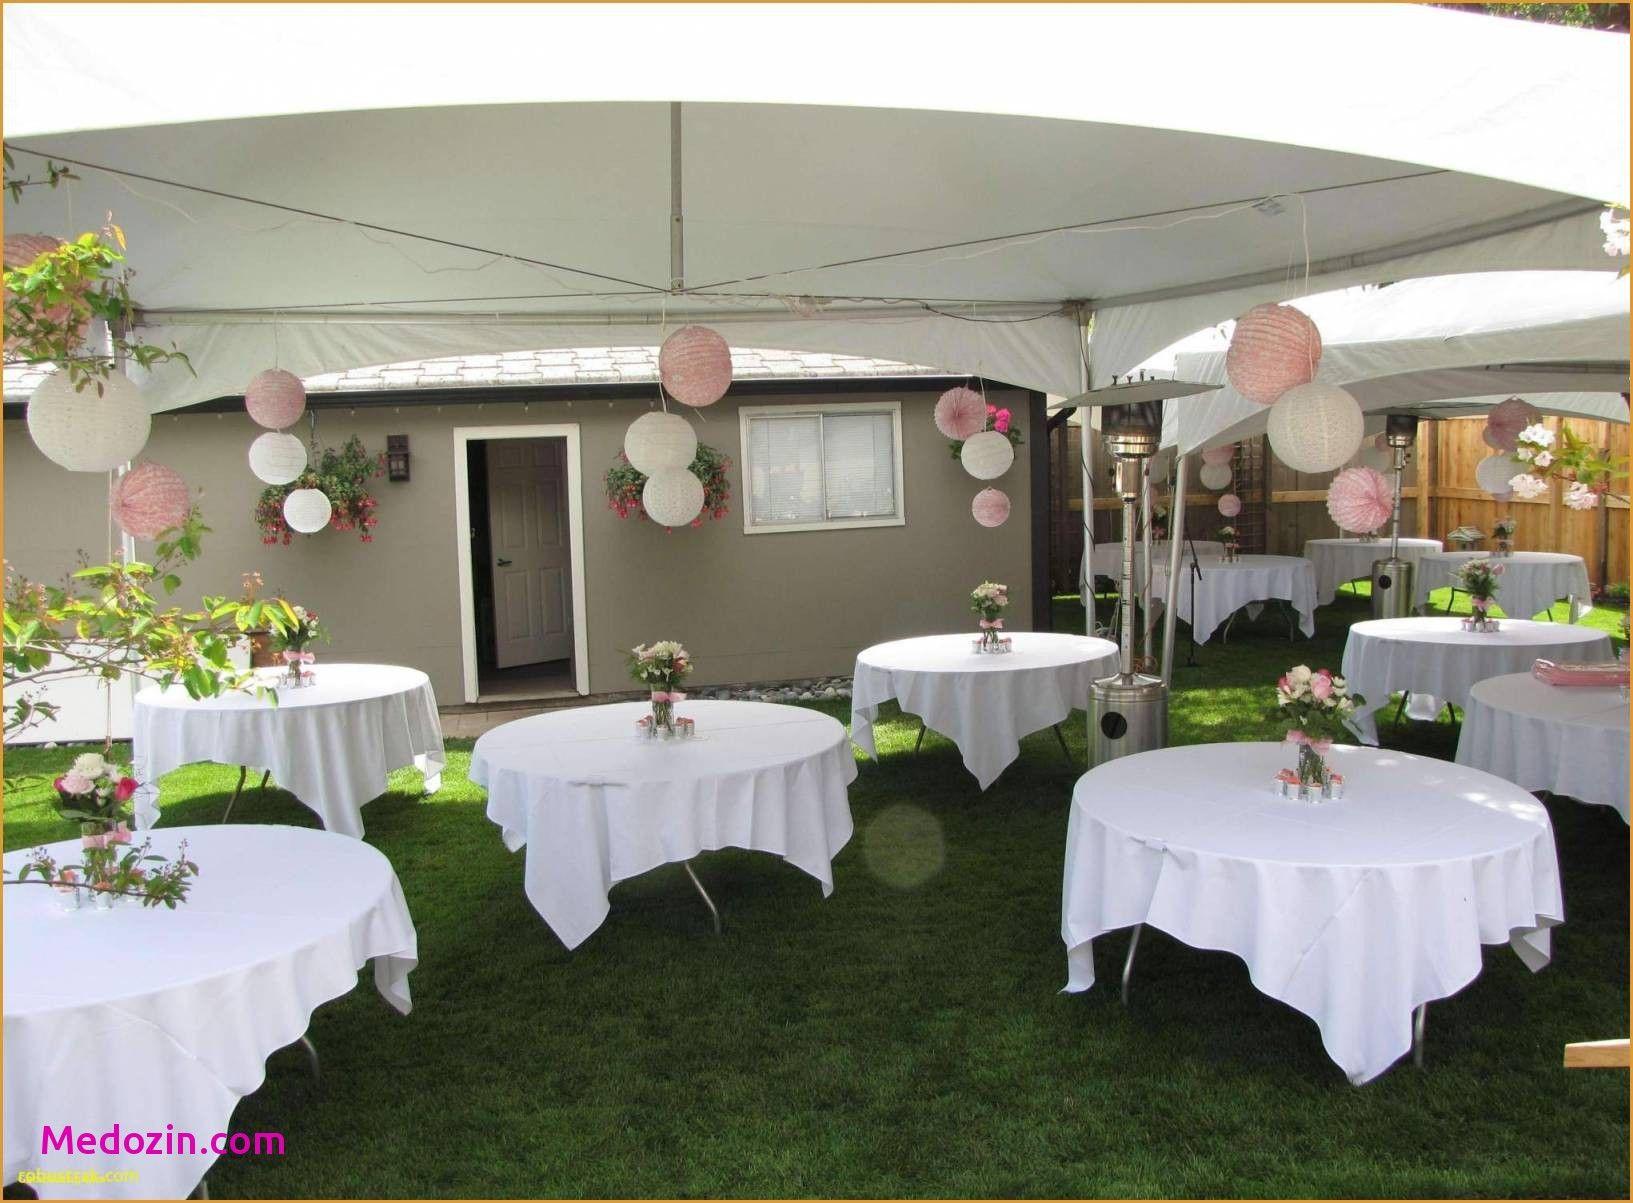 Backyard Wedding Tents Best Cheap Wedding Reception Ideas Tent